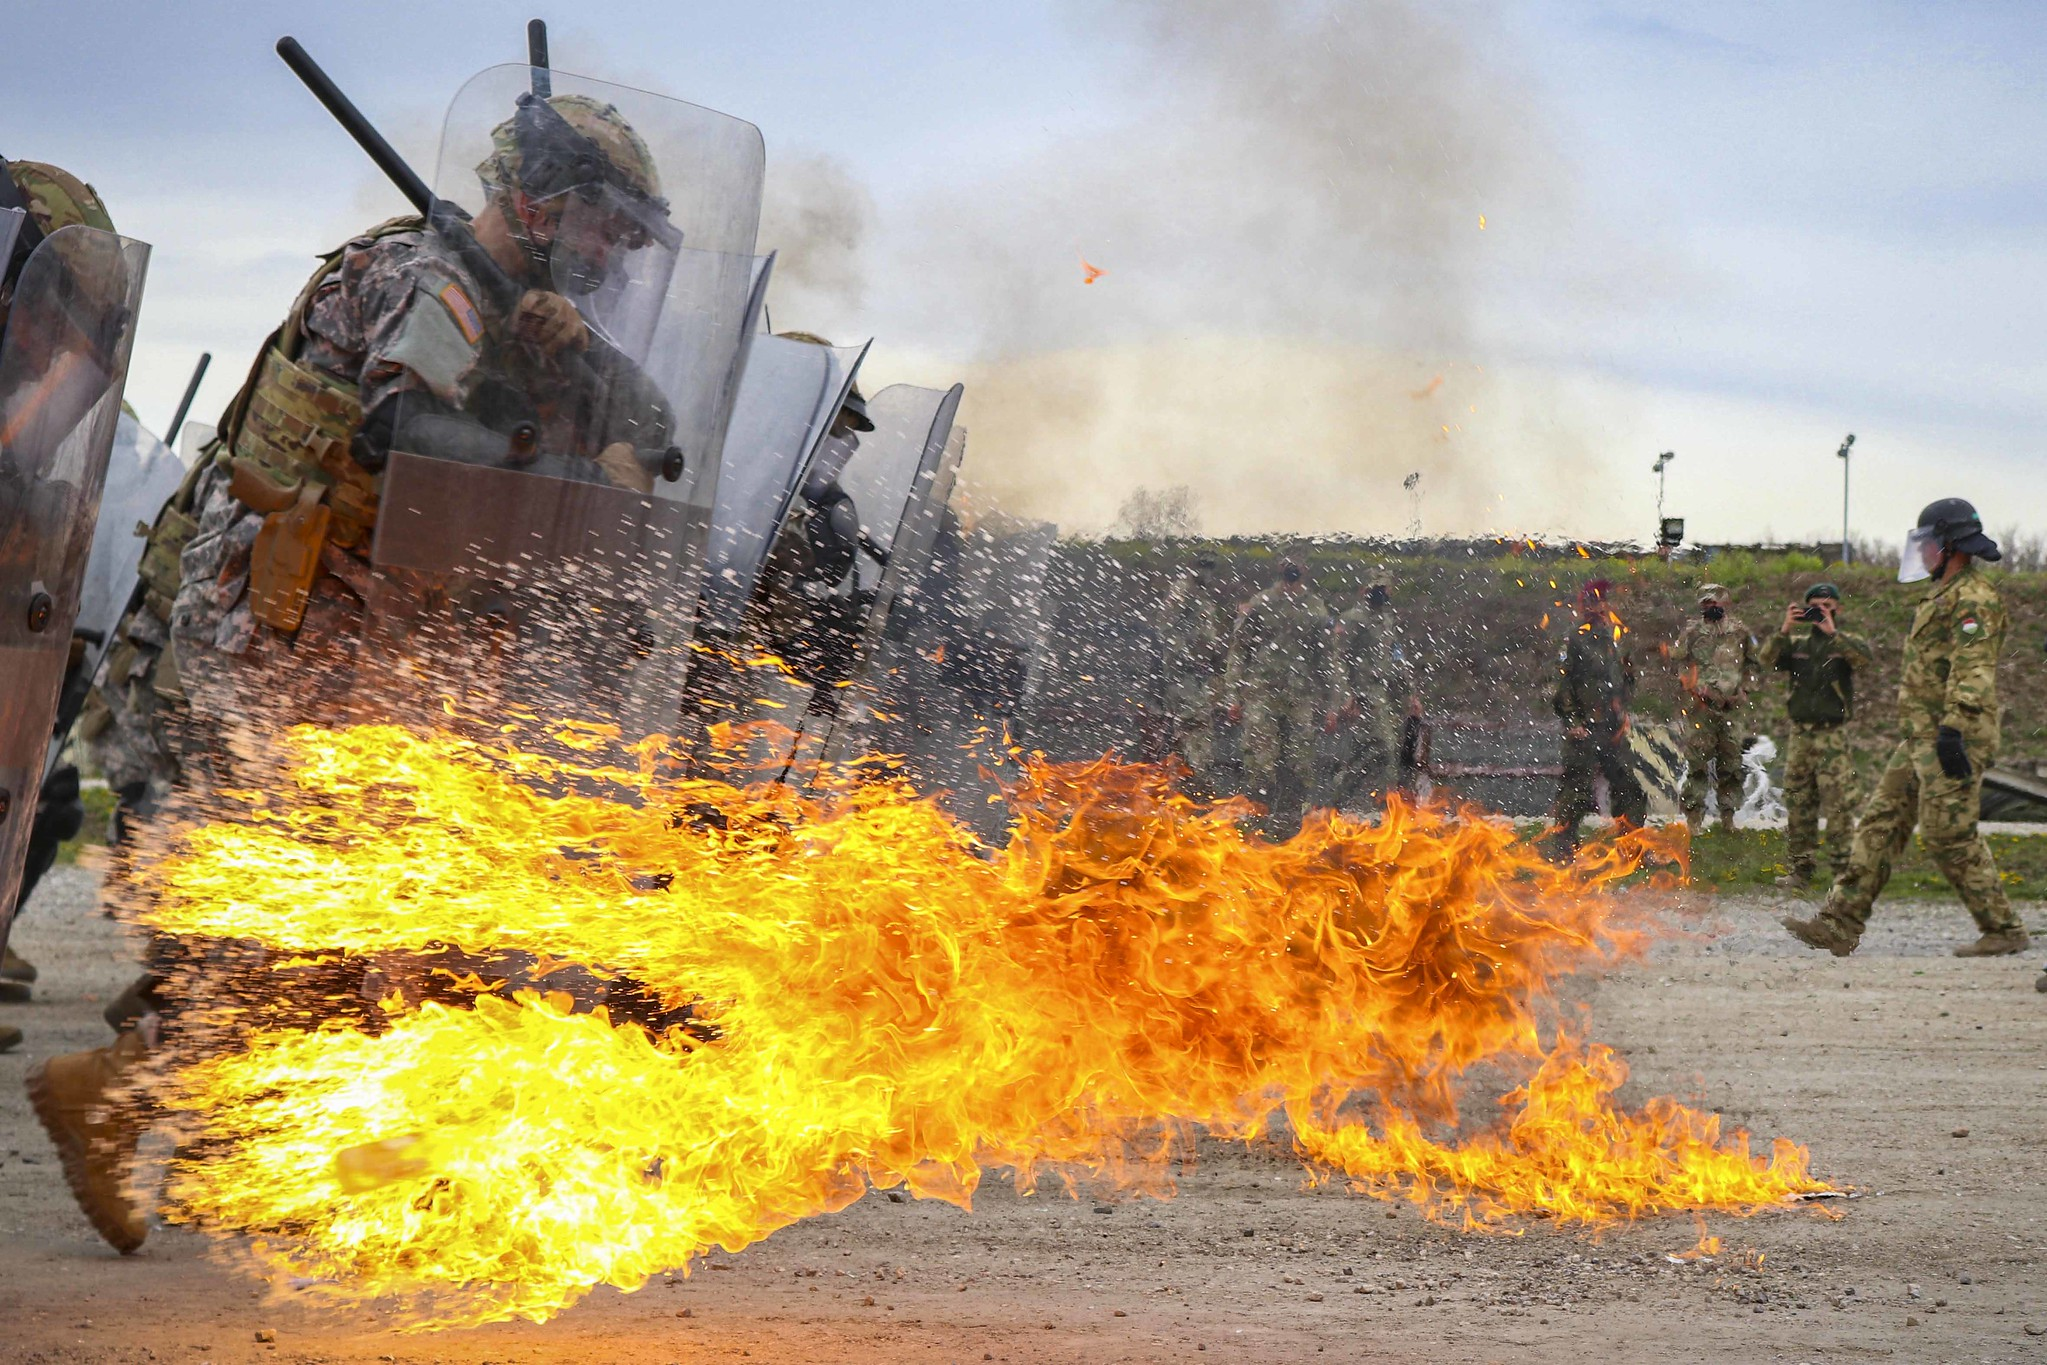 Iowa Army National Guardsmen run through a spray of gasoline and flames during fire phobia training at Camp Novo Selo, Kosovo, April 13, 2021. (Staff Sgt. Tawny Schmit/U.S. Army)